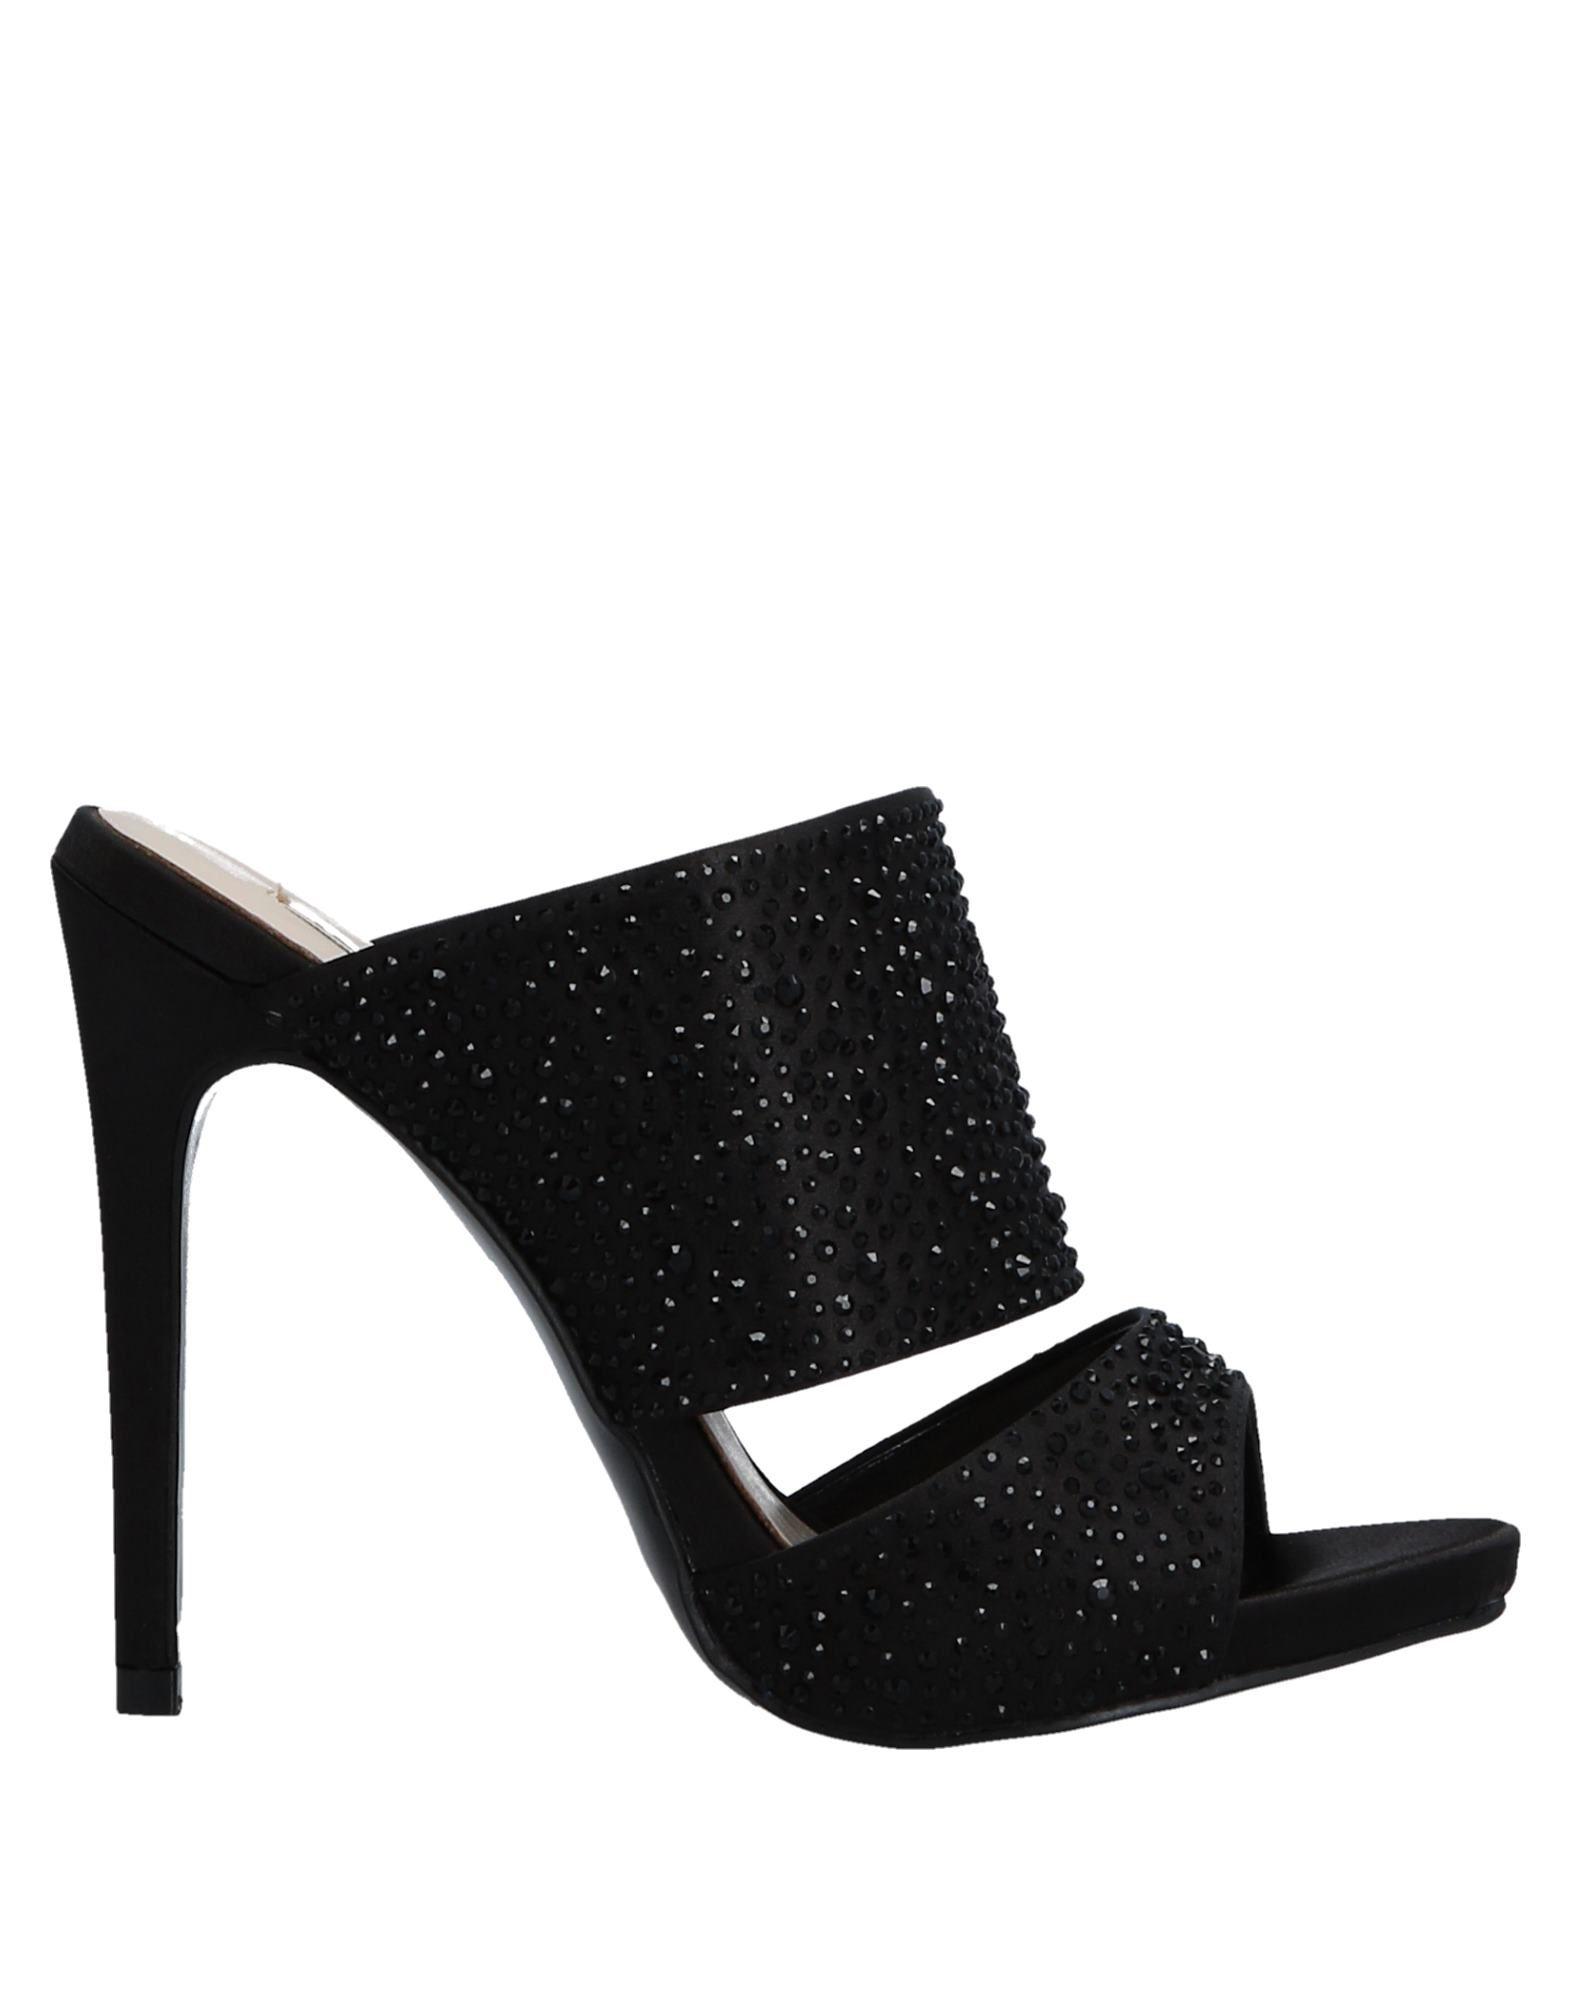 Ikaros Sandalen Damen  11532714FE Gute Qualität beliebte Schuhe